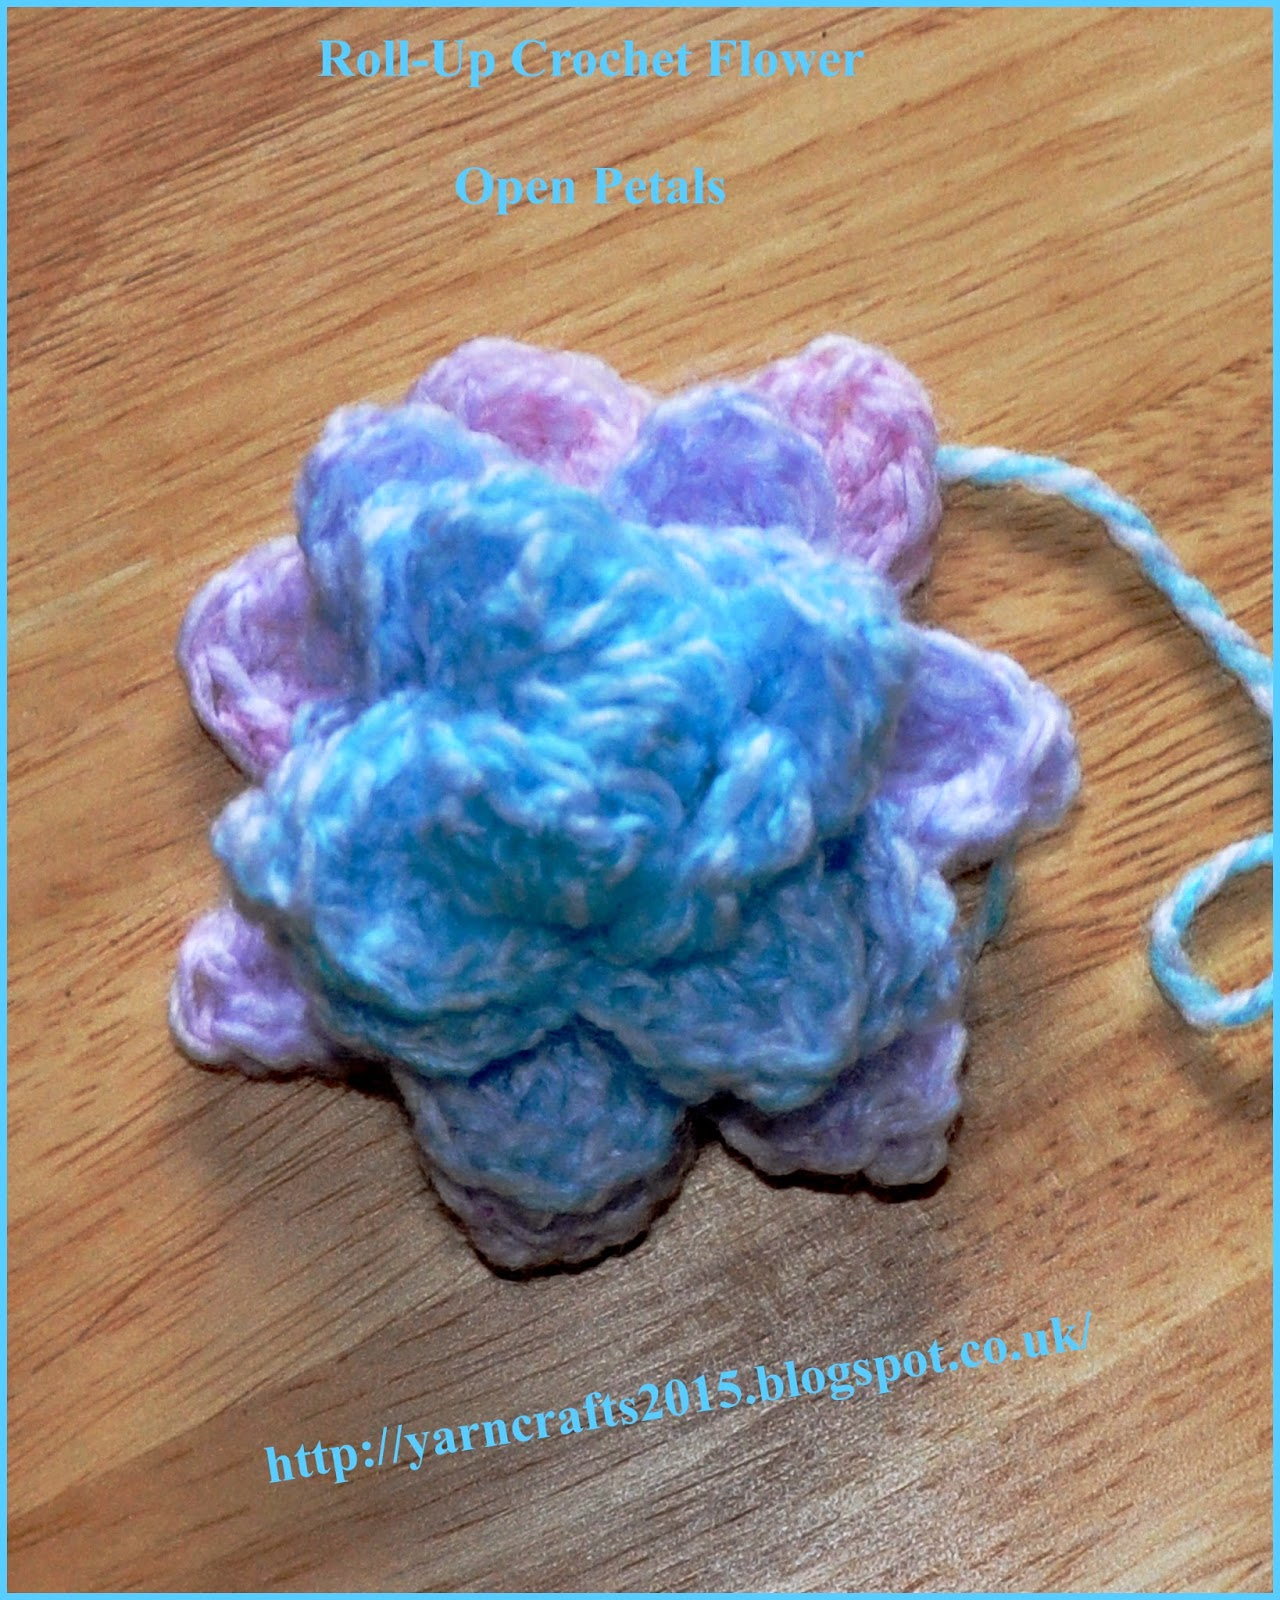 crochet flower open petals